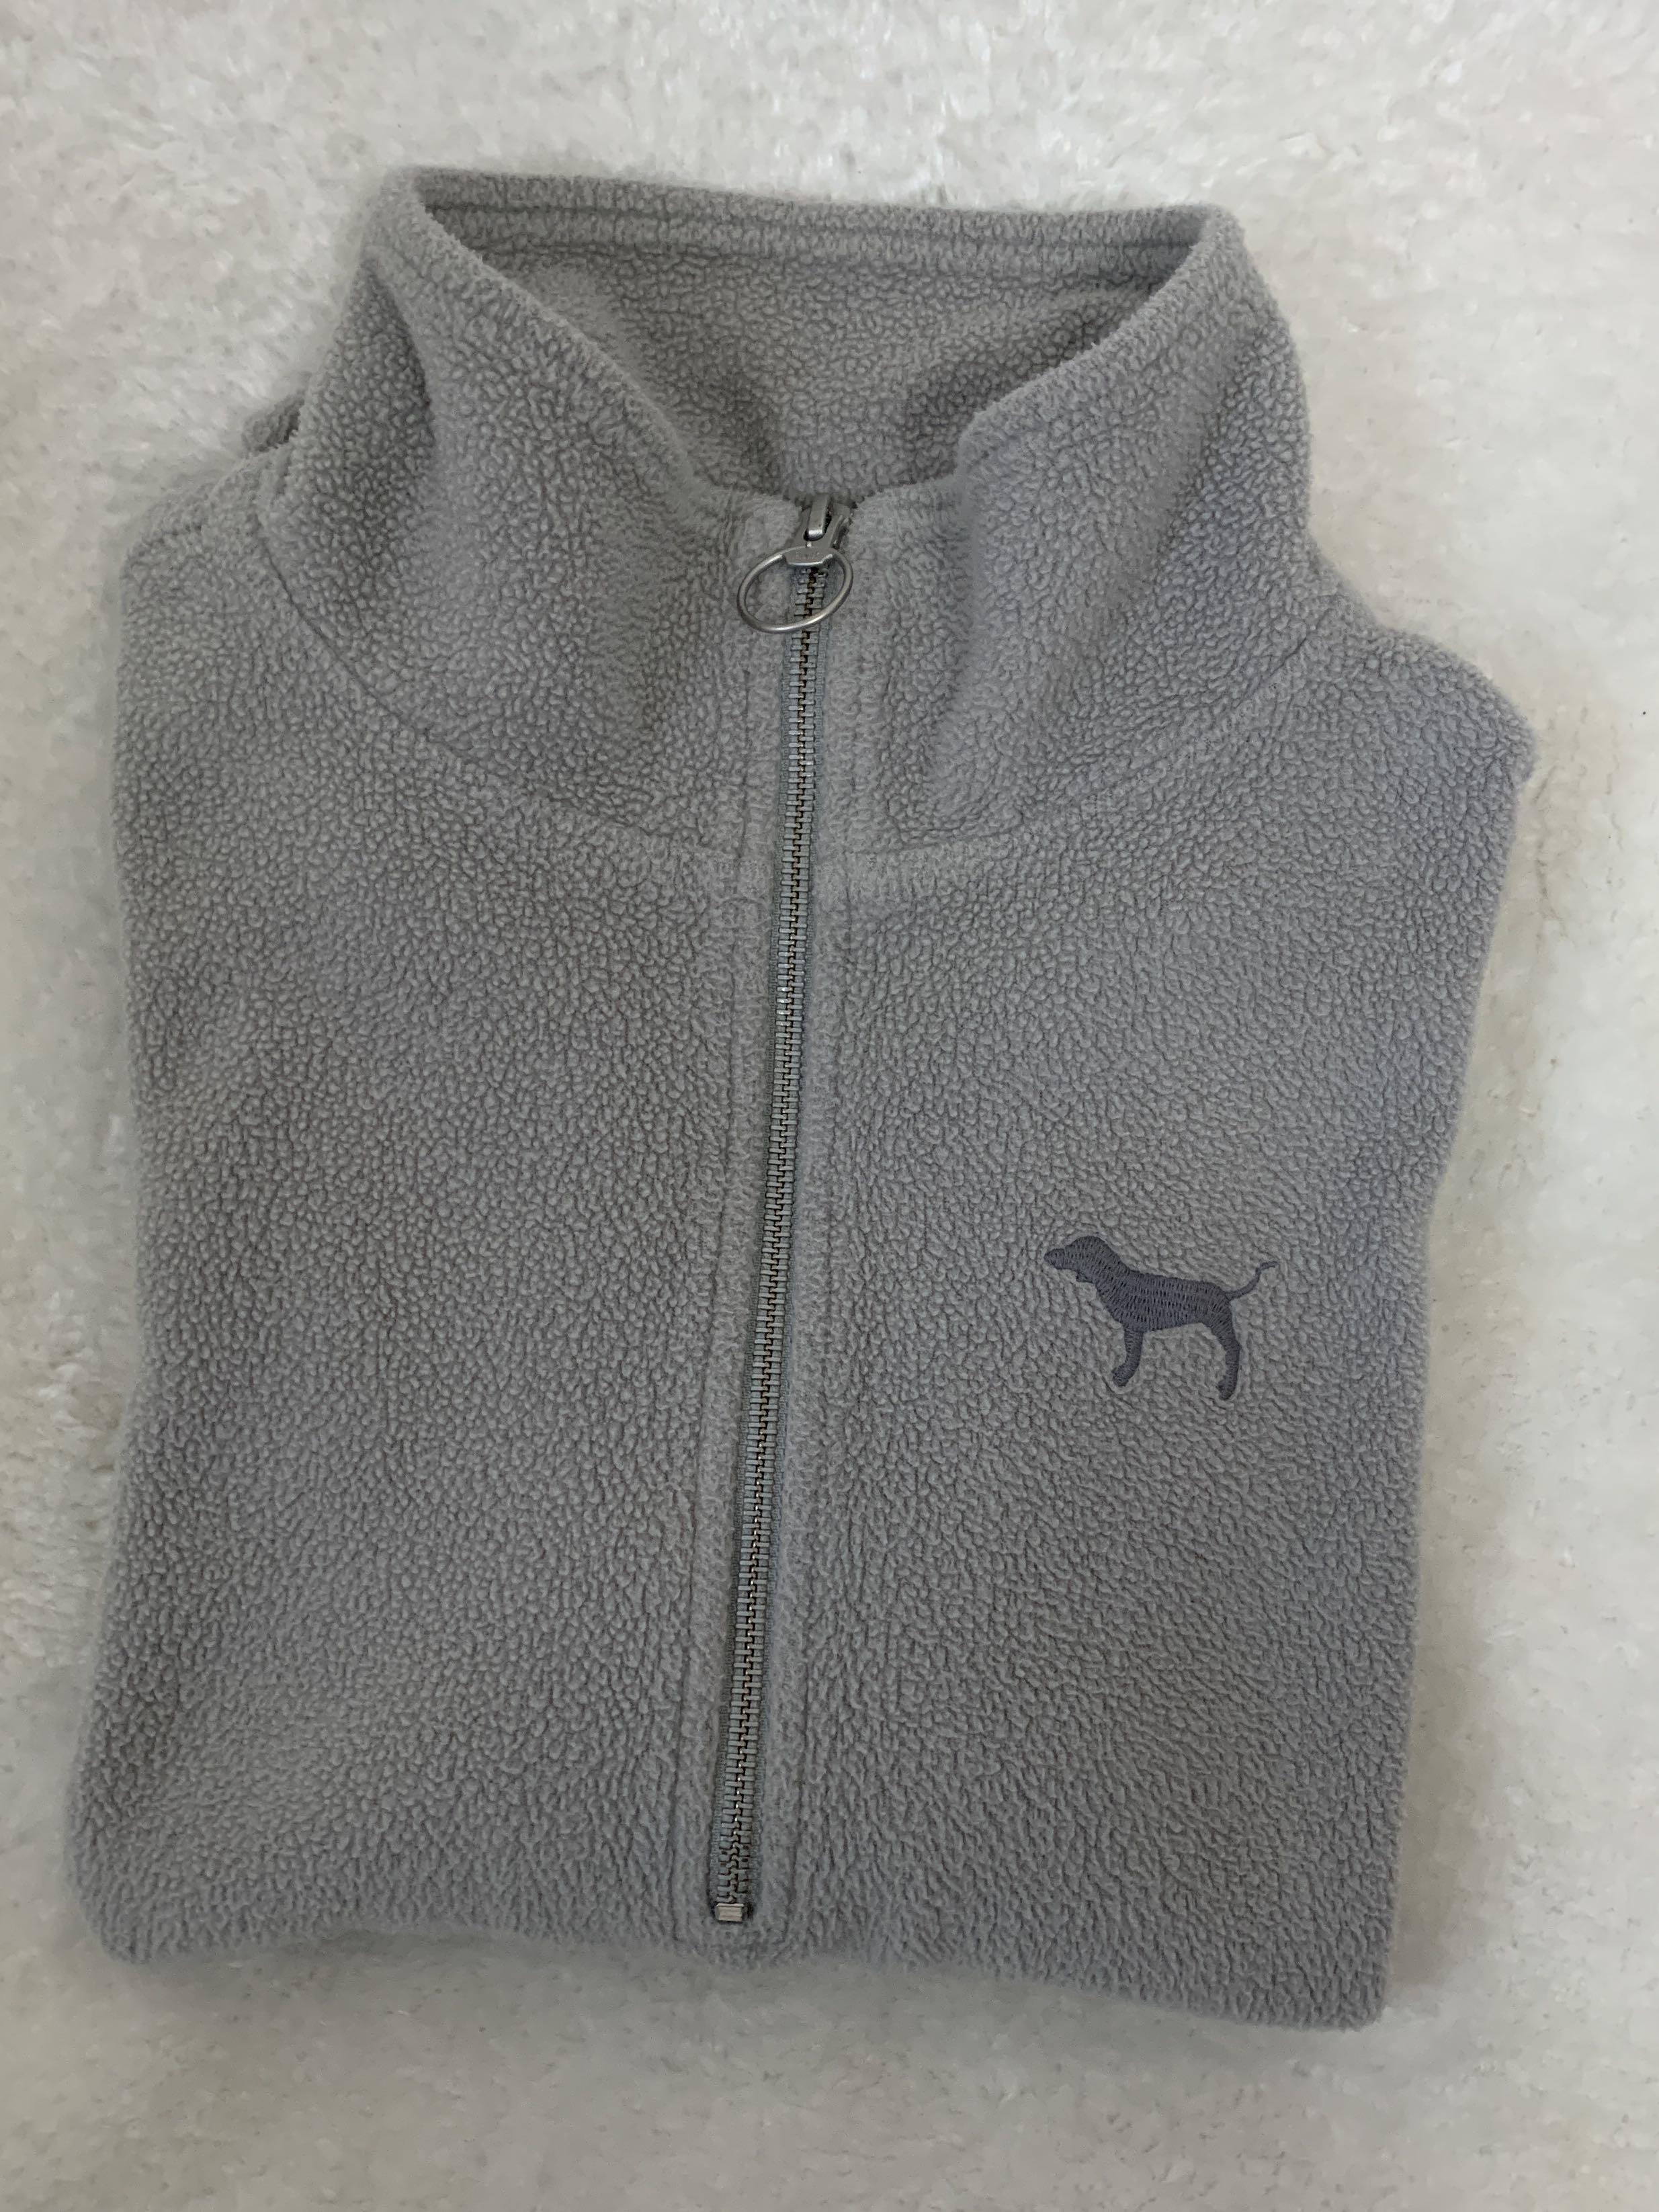 VS Pink sweater xs fits s/m womens